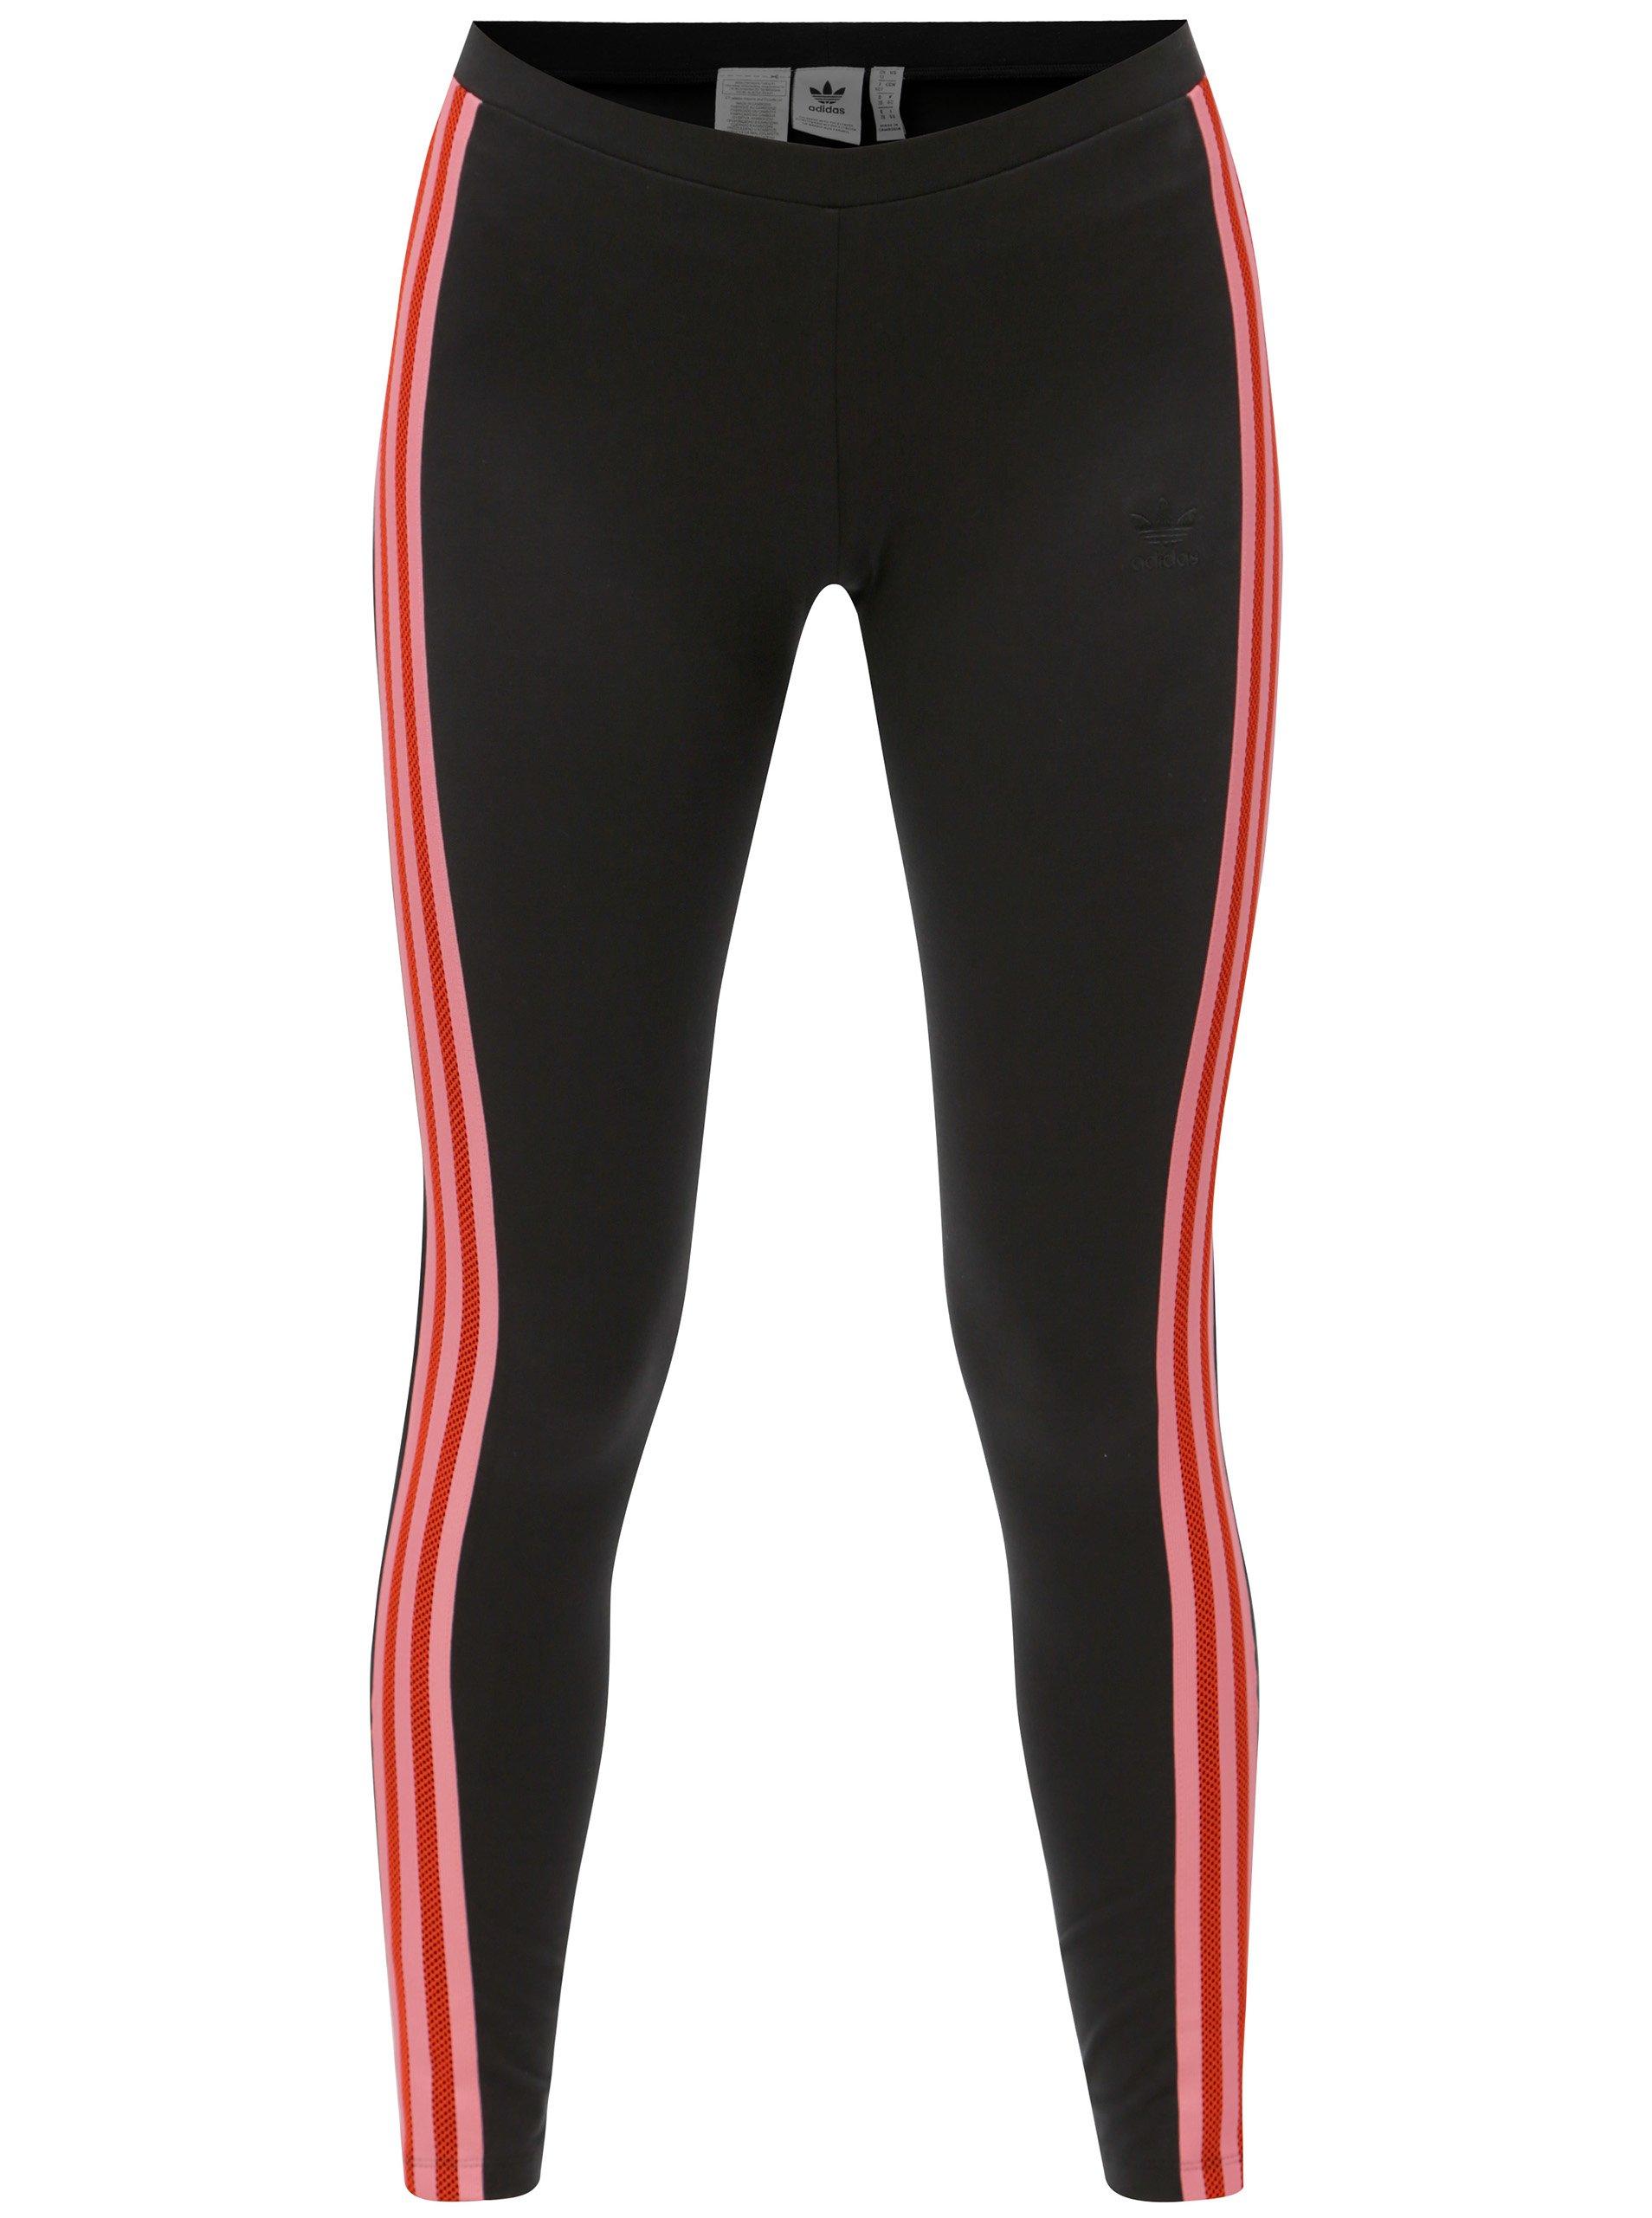 19dc2af233a3 Čierne dámske legíny s pruhmi adidas Originals